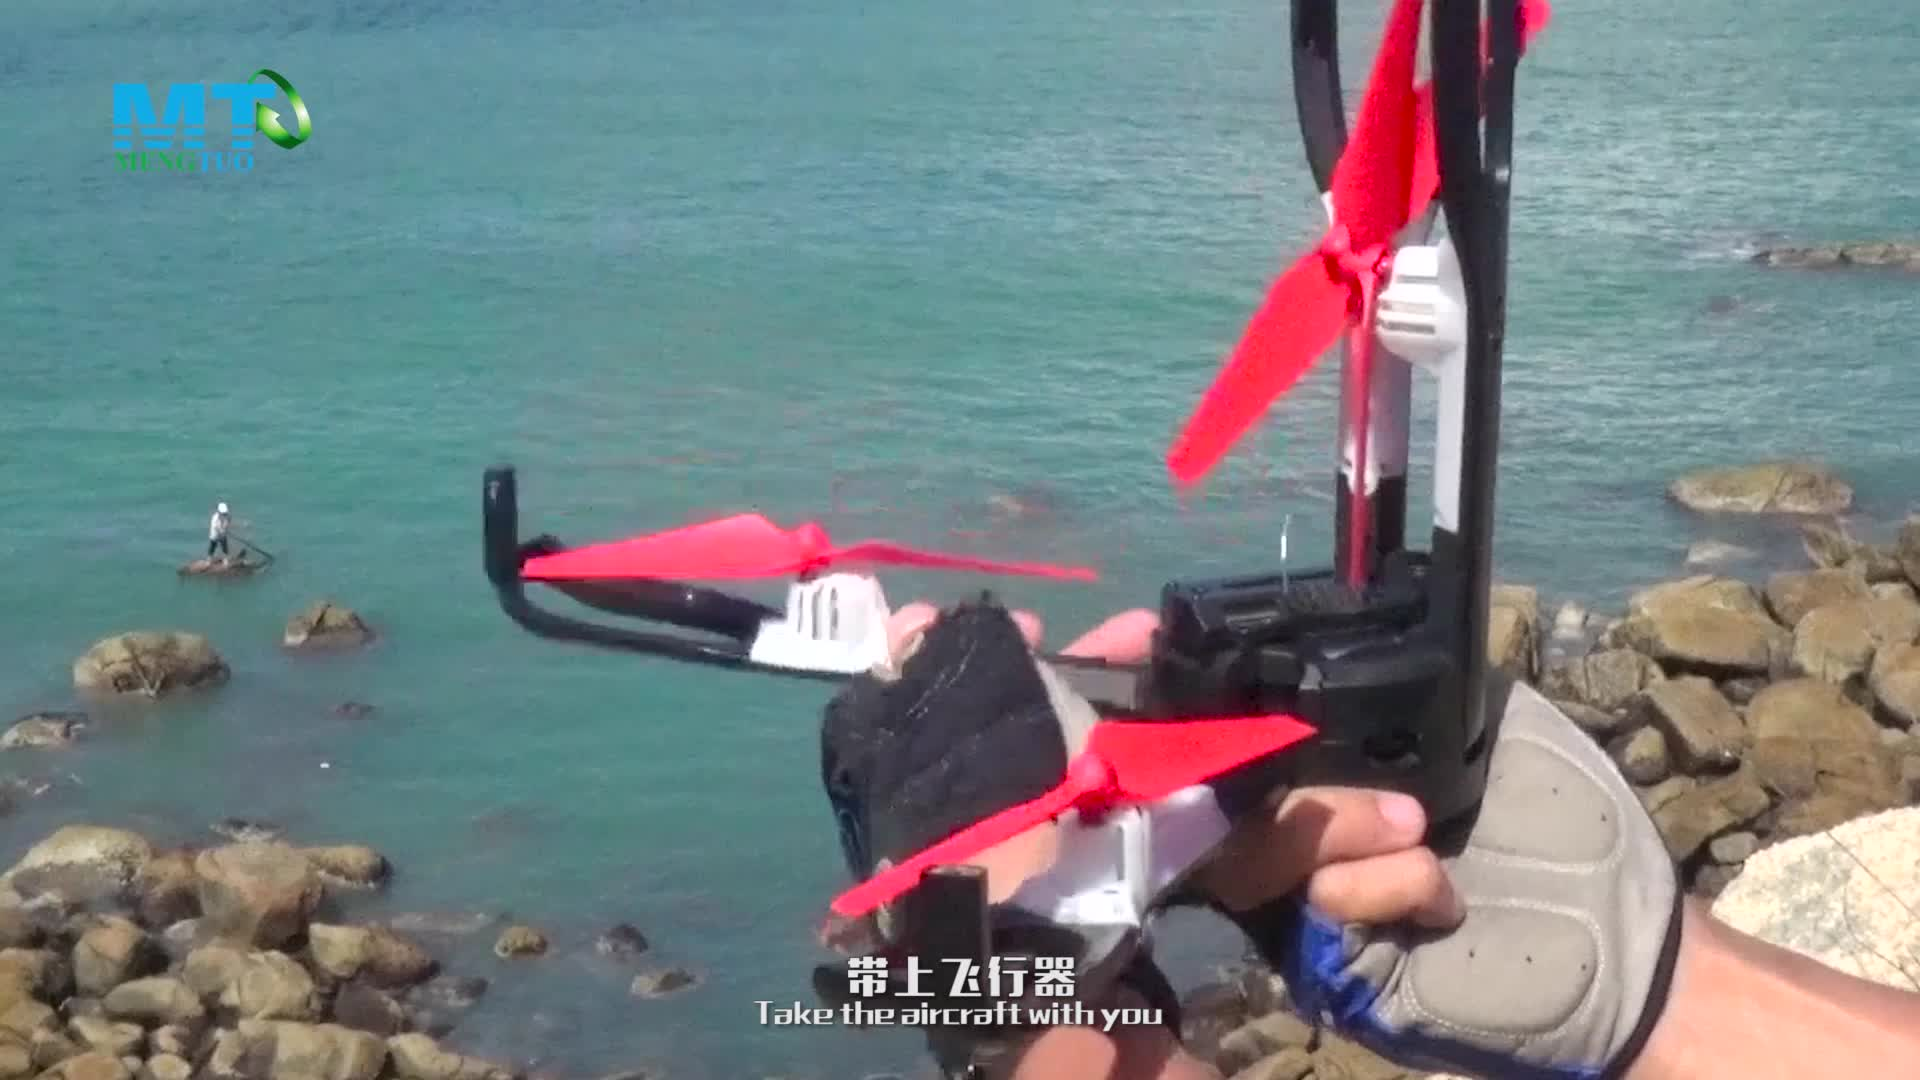 1080 P HD GPS 30 Min Uzun Uçuş Süresi 250 M uzun menzilli mesafe TAKıMı BANA katlanır FPV 5G Kamera GPS Uçağı quadcopter M9955